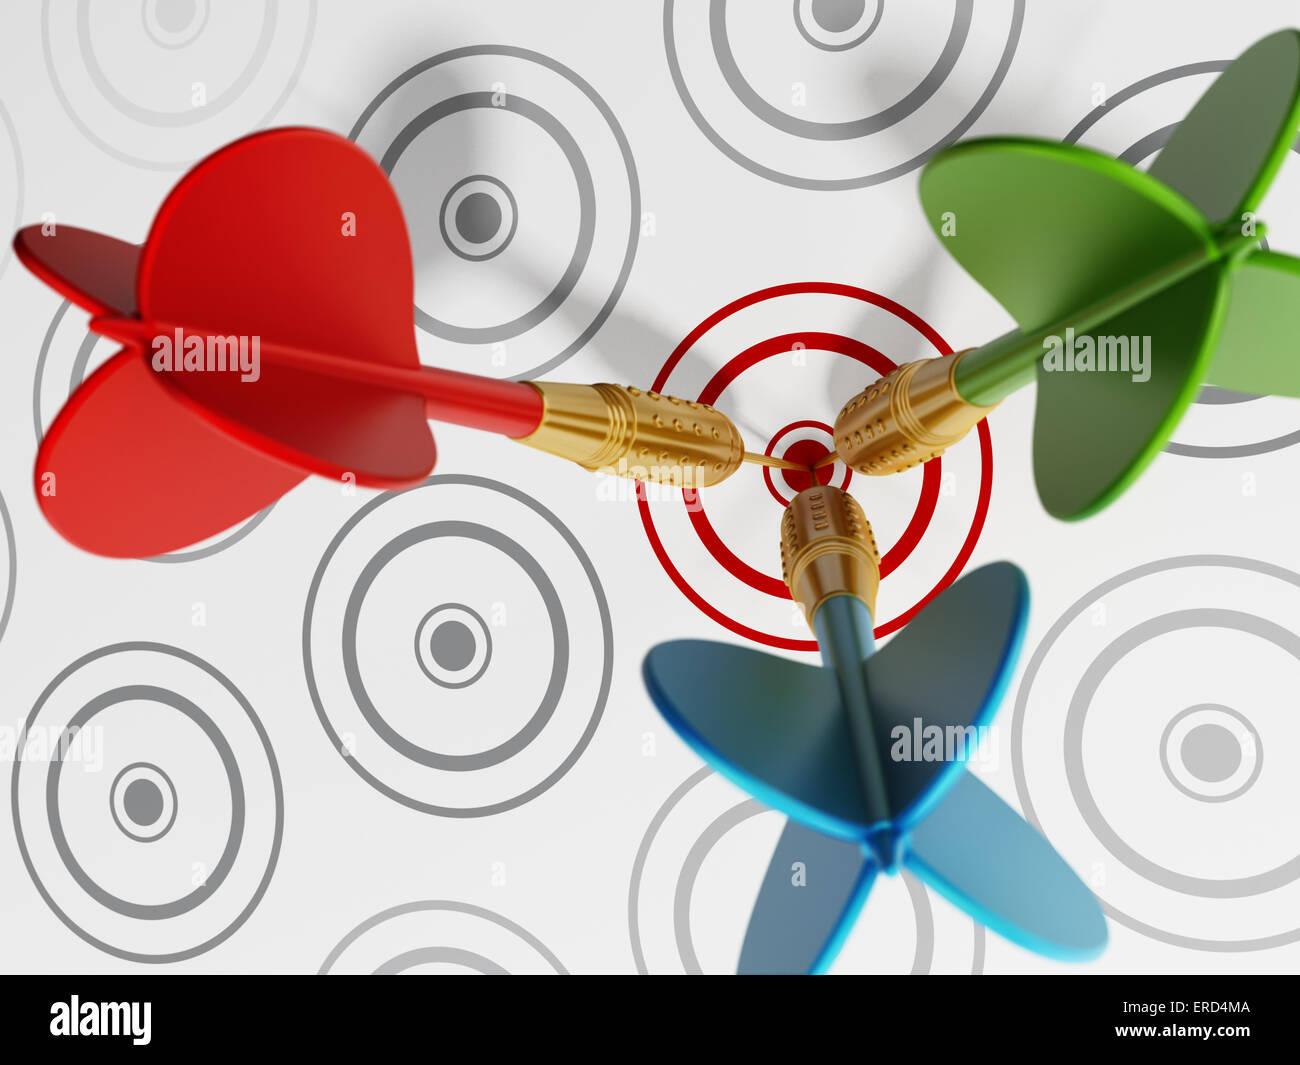 Three darts hitting red target among gray ones. - Stock Image